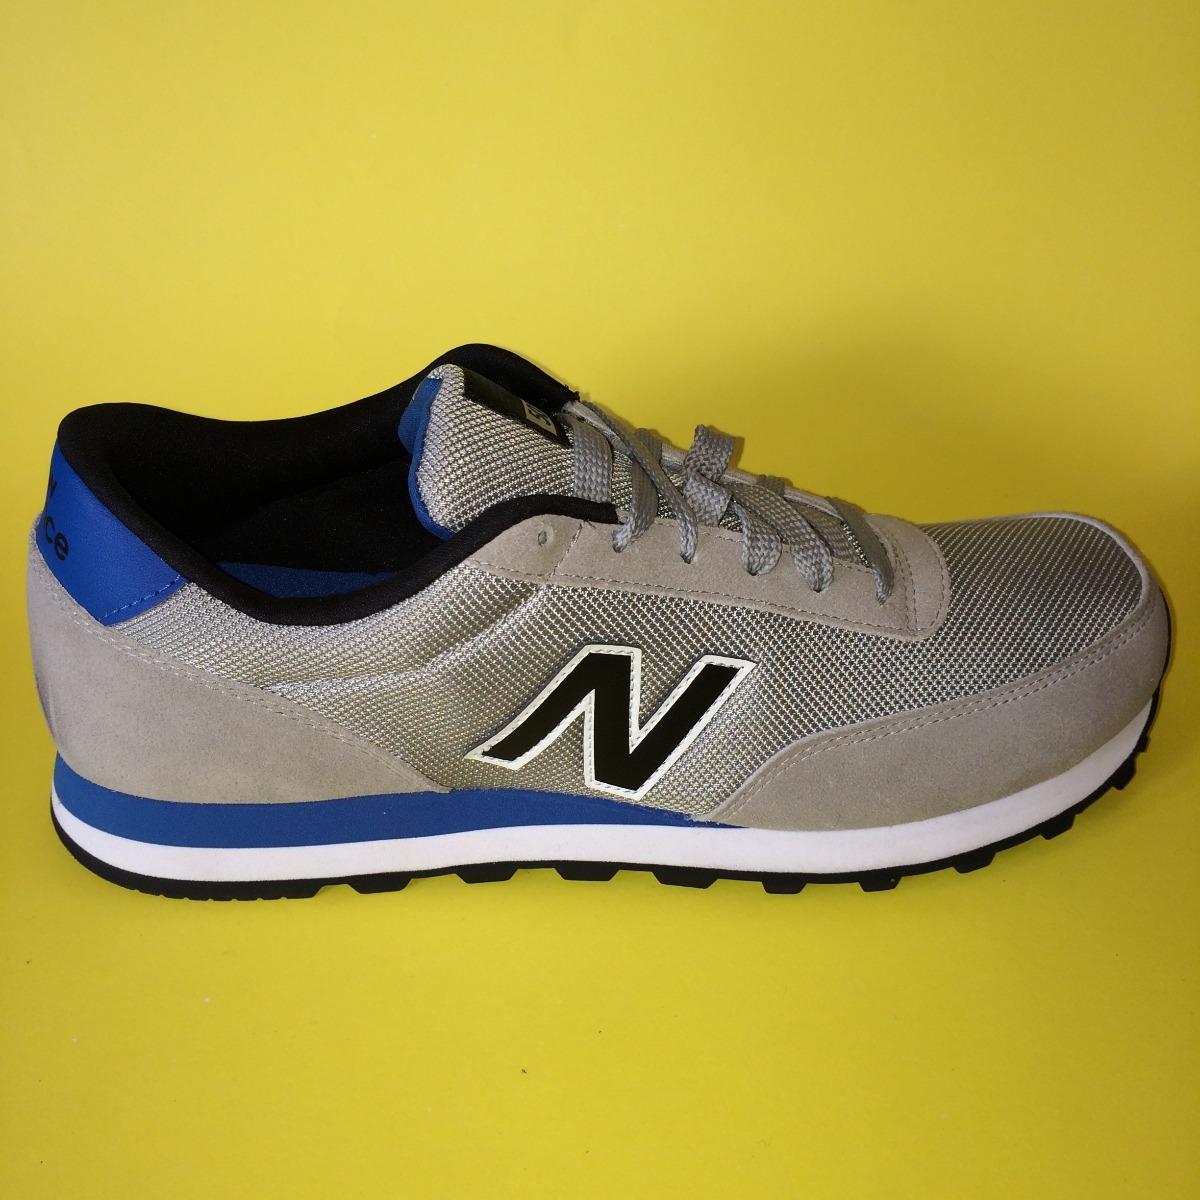 En Zapatos Originales 42 Hombres Balance New Ml501ccb 00 Para Bs qrxBzWqn